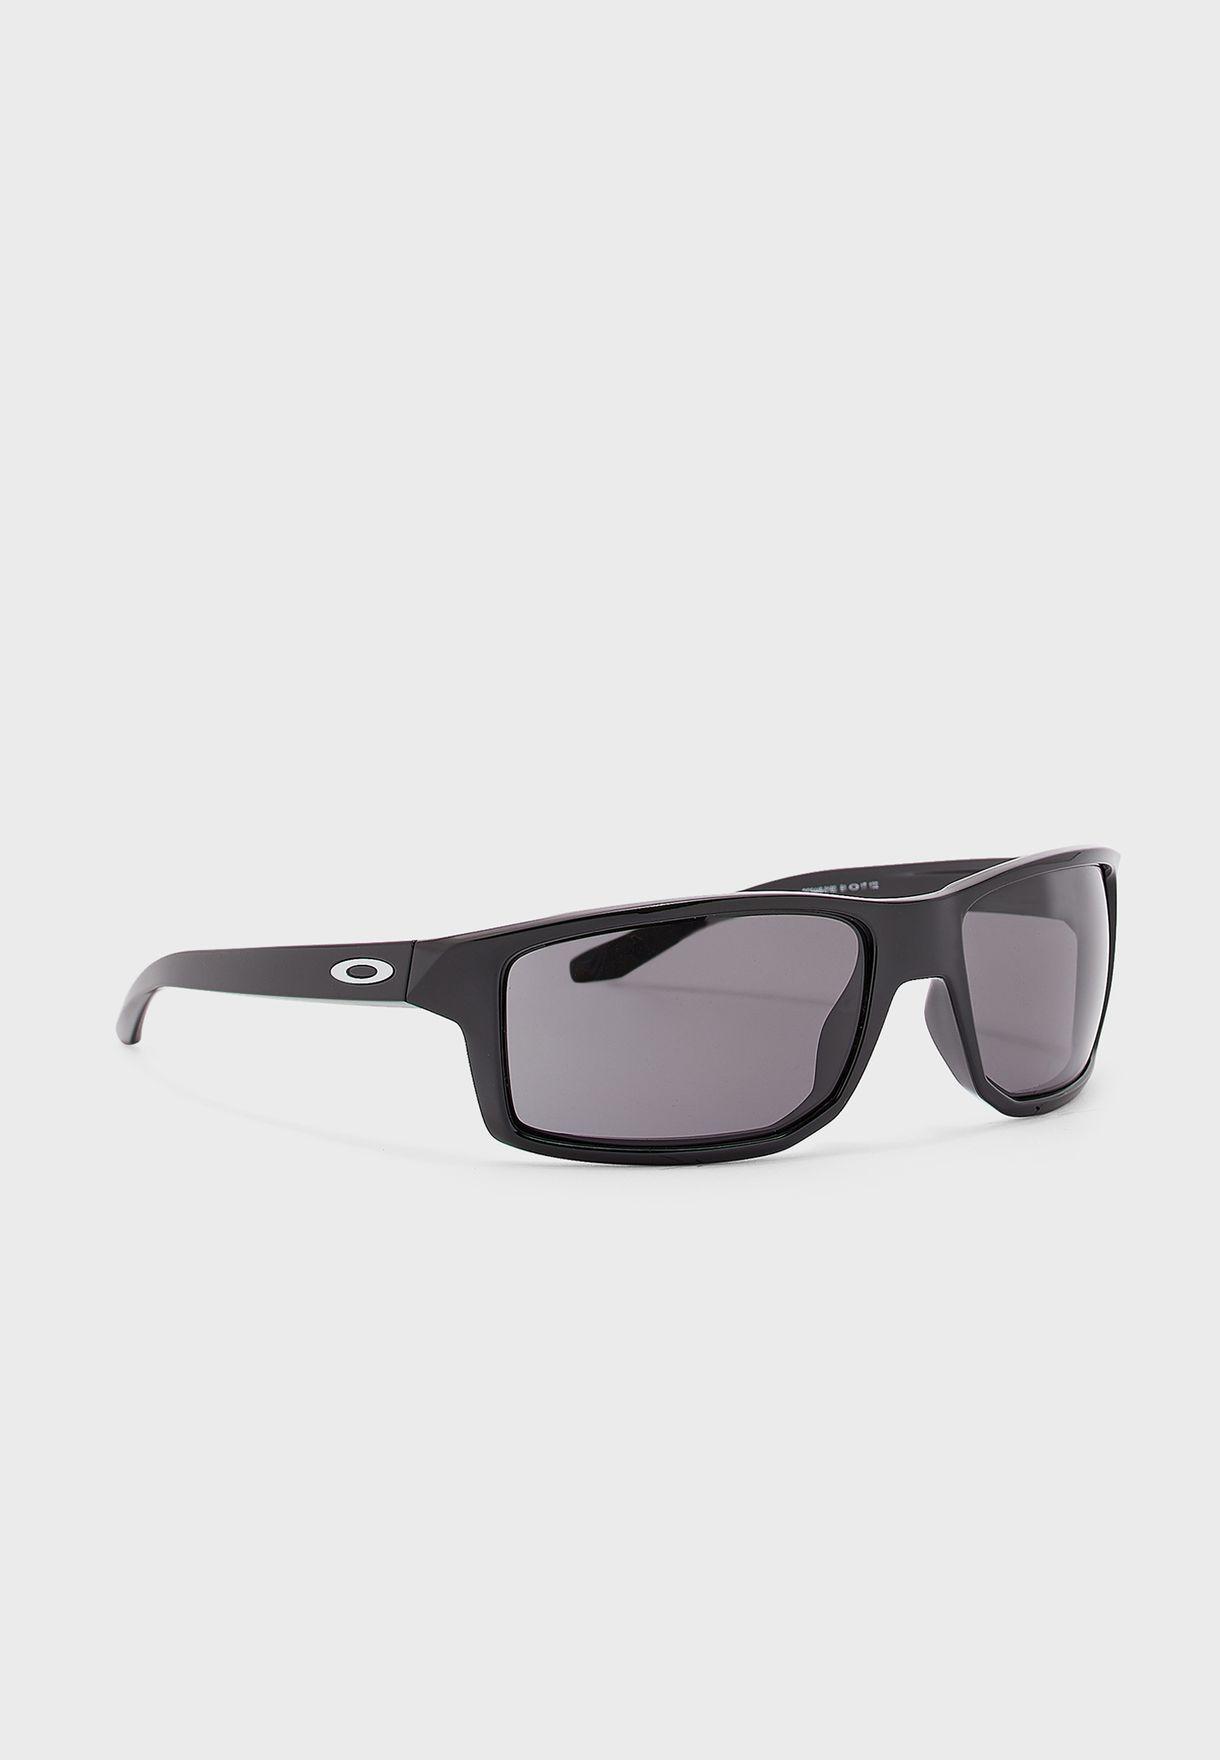 94490160 Wayfarer Sunglasses